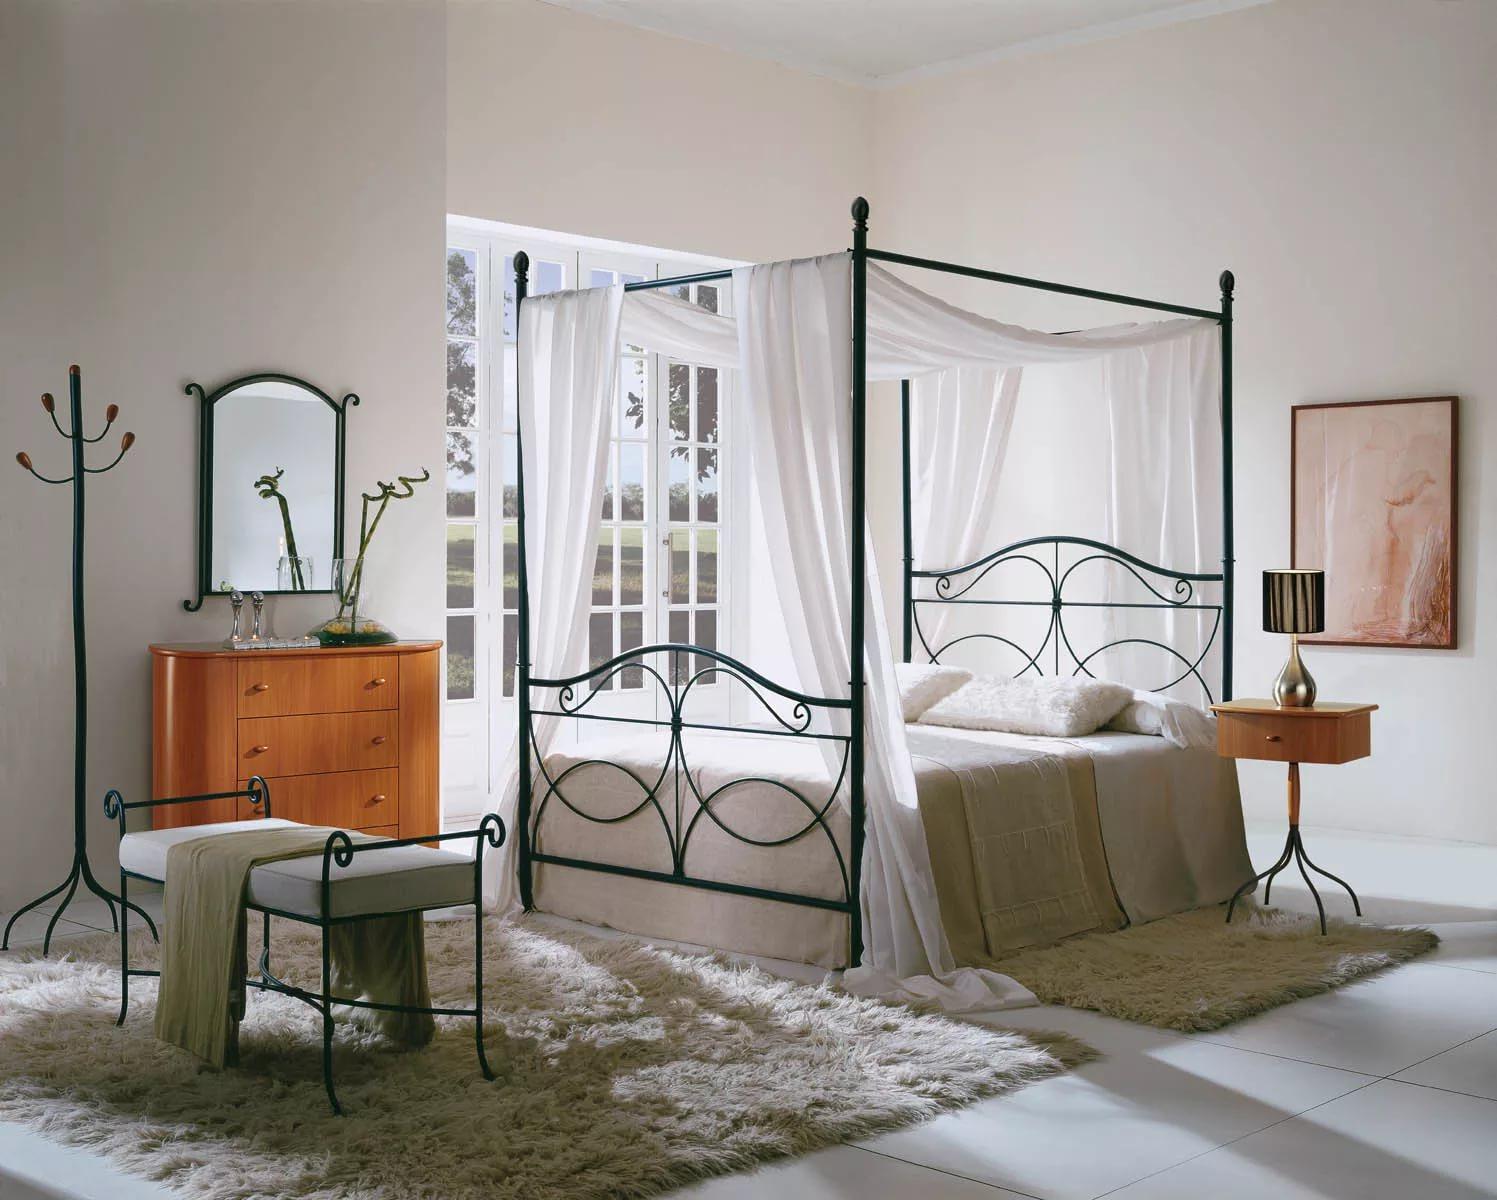 Пример кровати с красивым балдахином